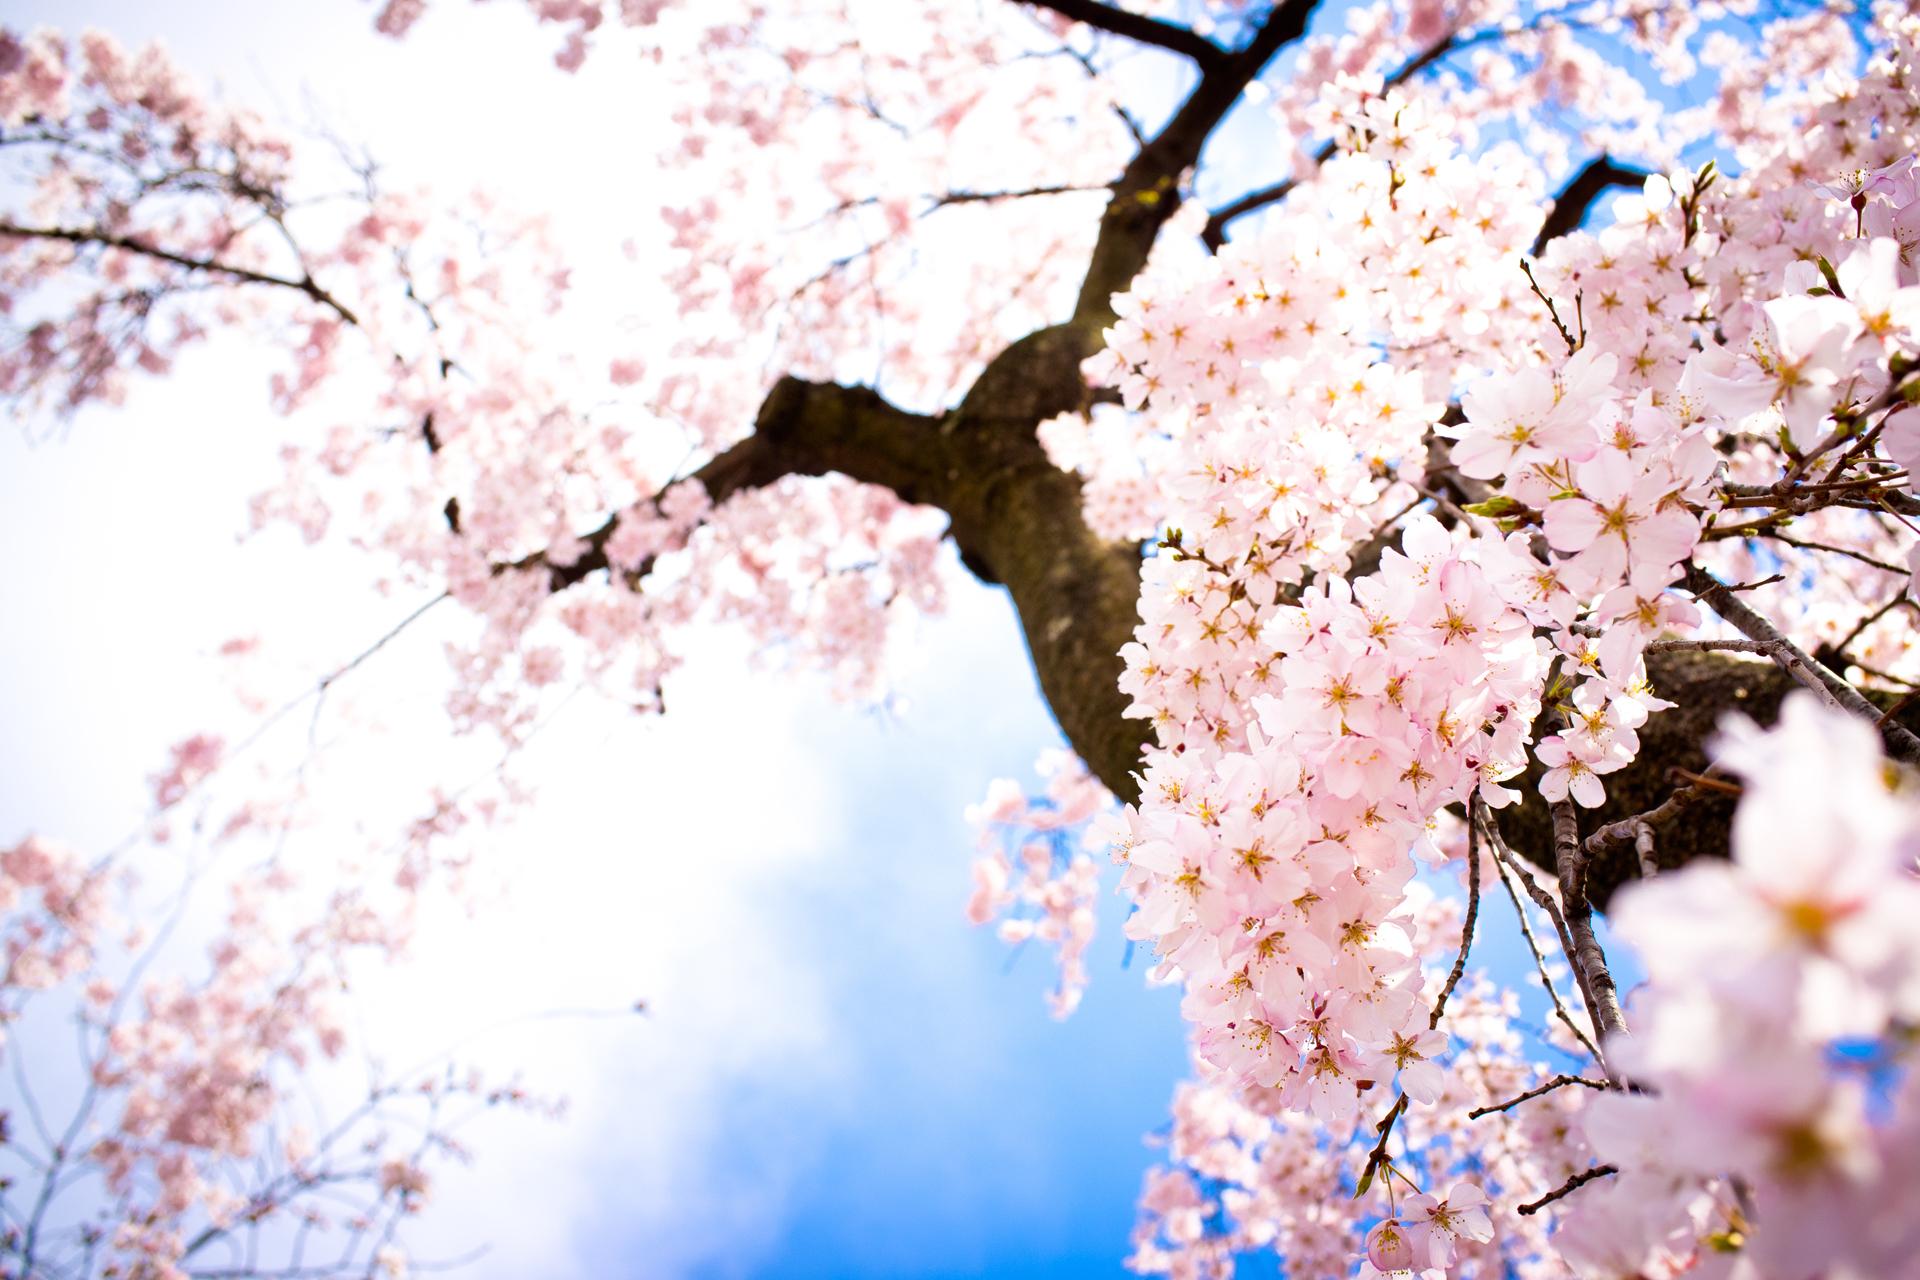 Cool Flowers Desktop Backgrounds Cherry Blossom HD 1920x1280